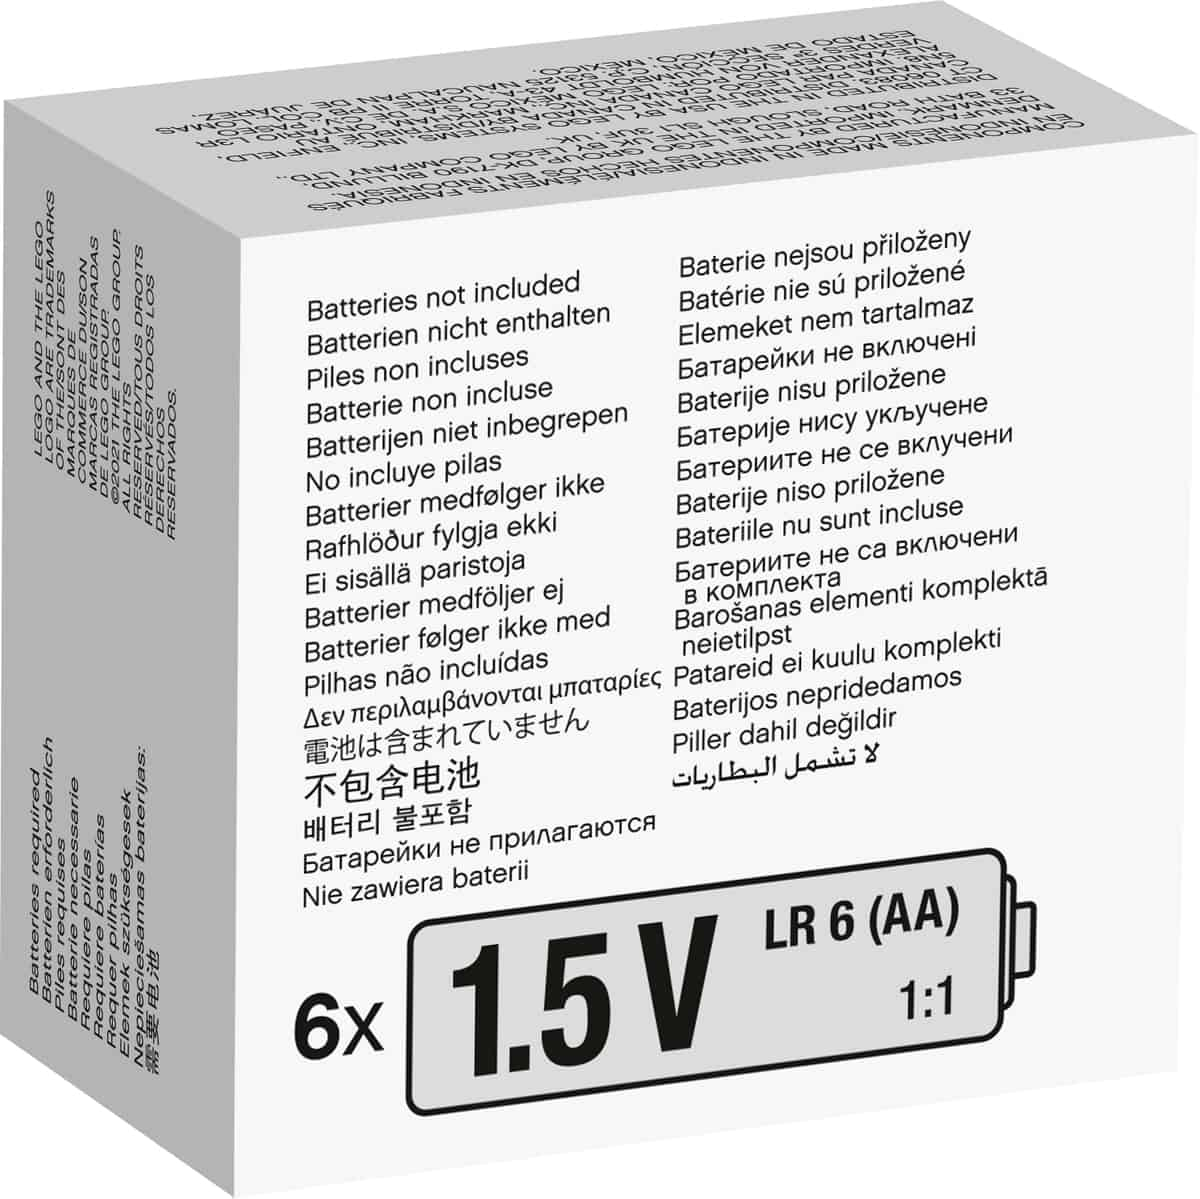 lego 88015 batteriboks